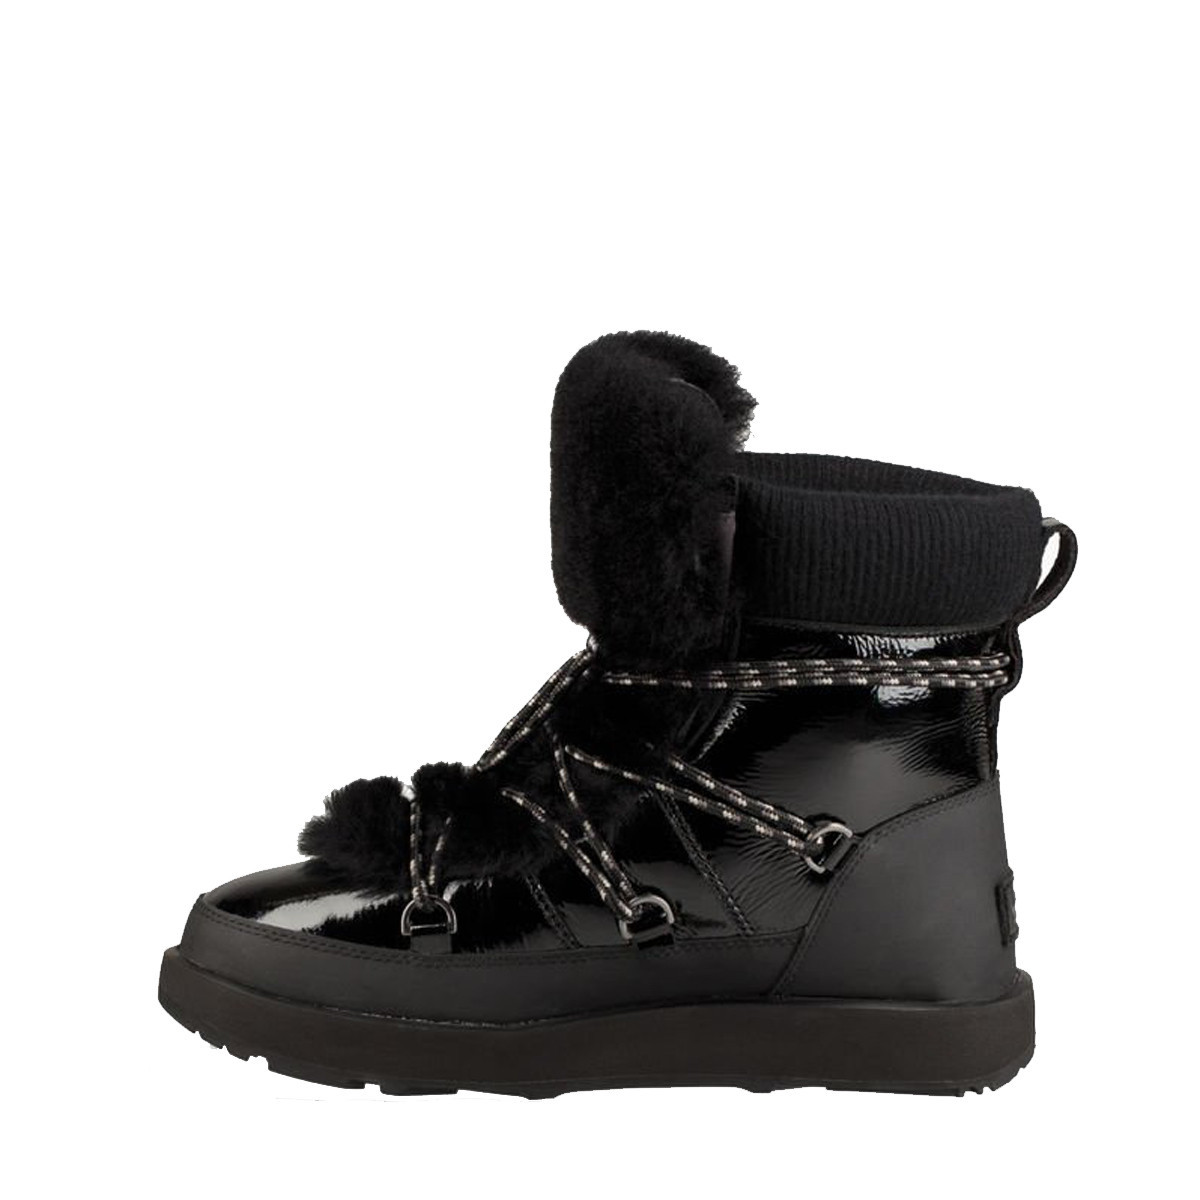 com Lacets Chaussures Highland À WaterproofnoirDowntownstock Ugg kOZTiwlPXu